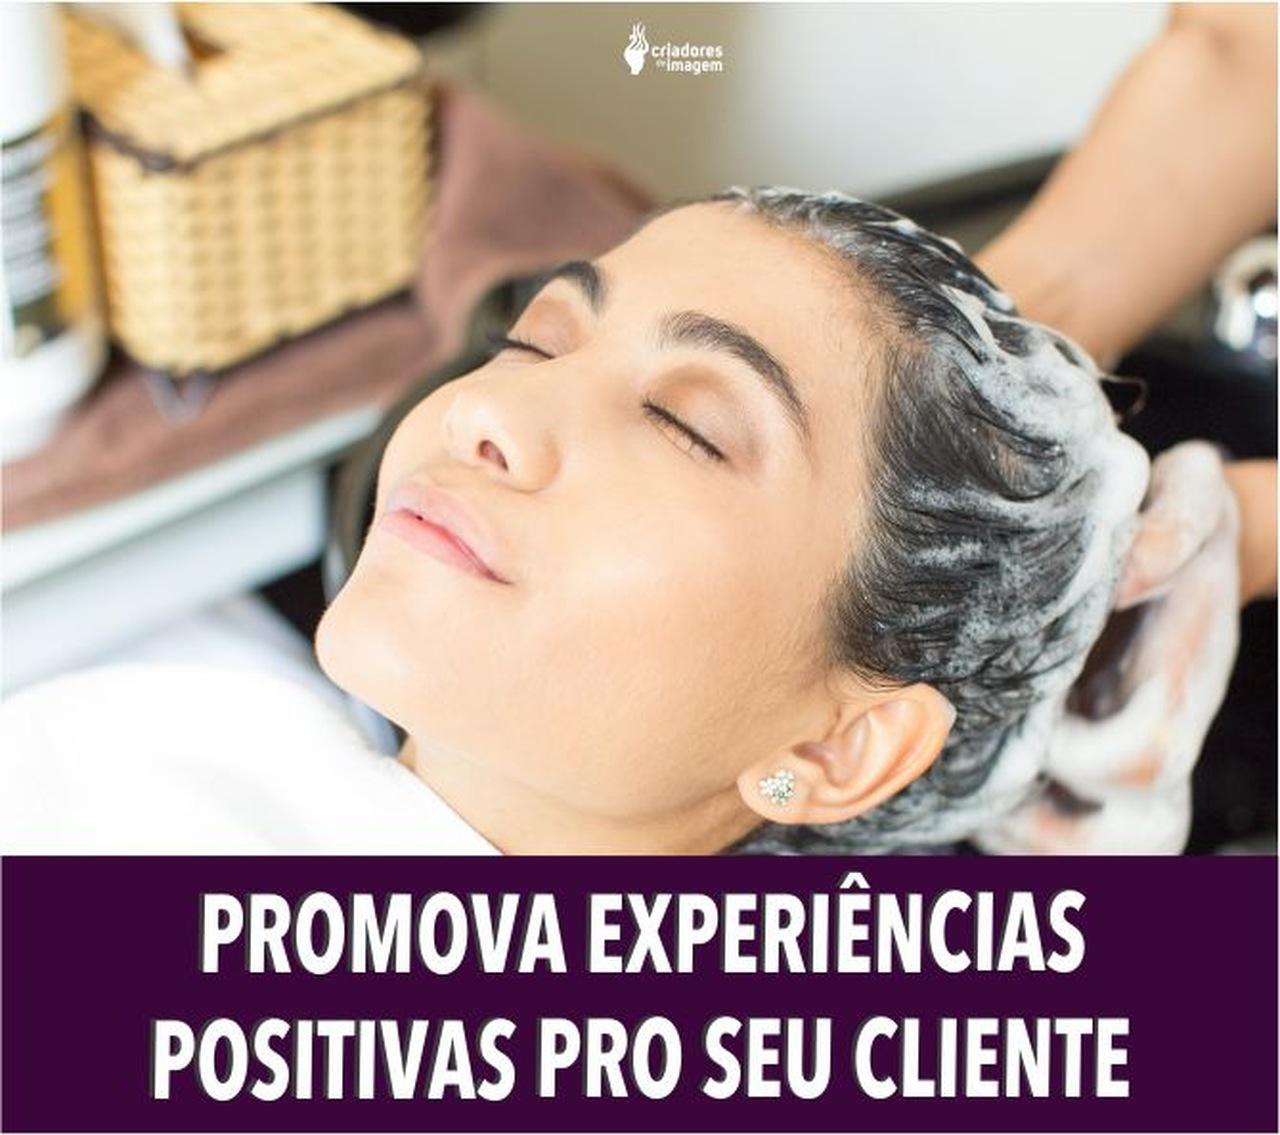 EXPERIENCIAS POSITIVAS CLIENTE SALÃO DE BELEZA CABELEIREIRO, encantamento nos clientes,